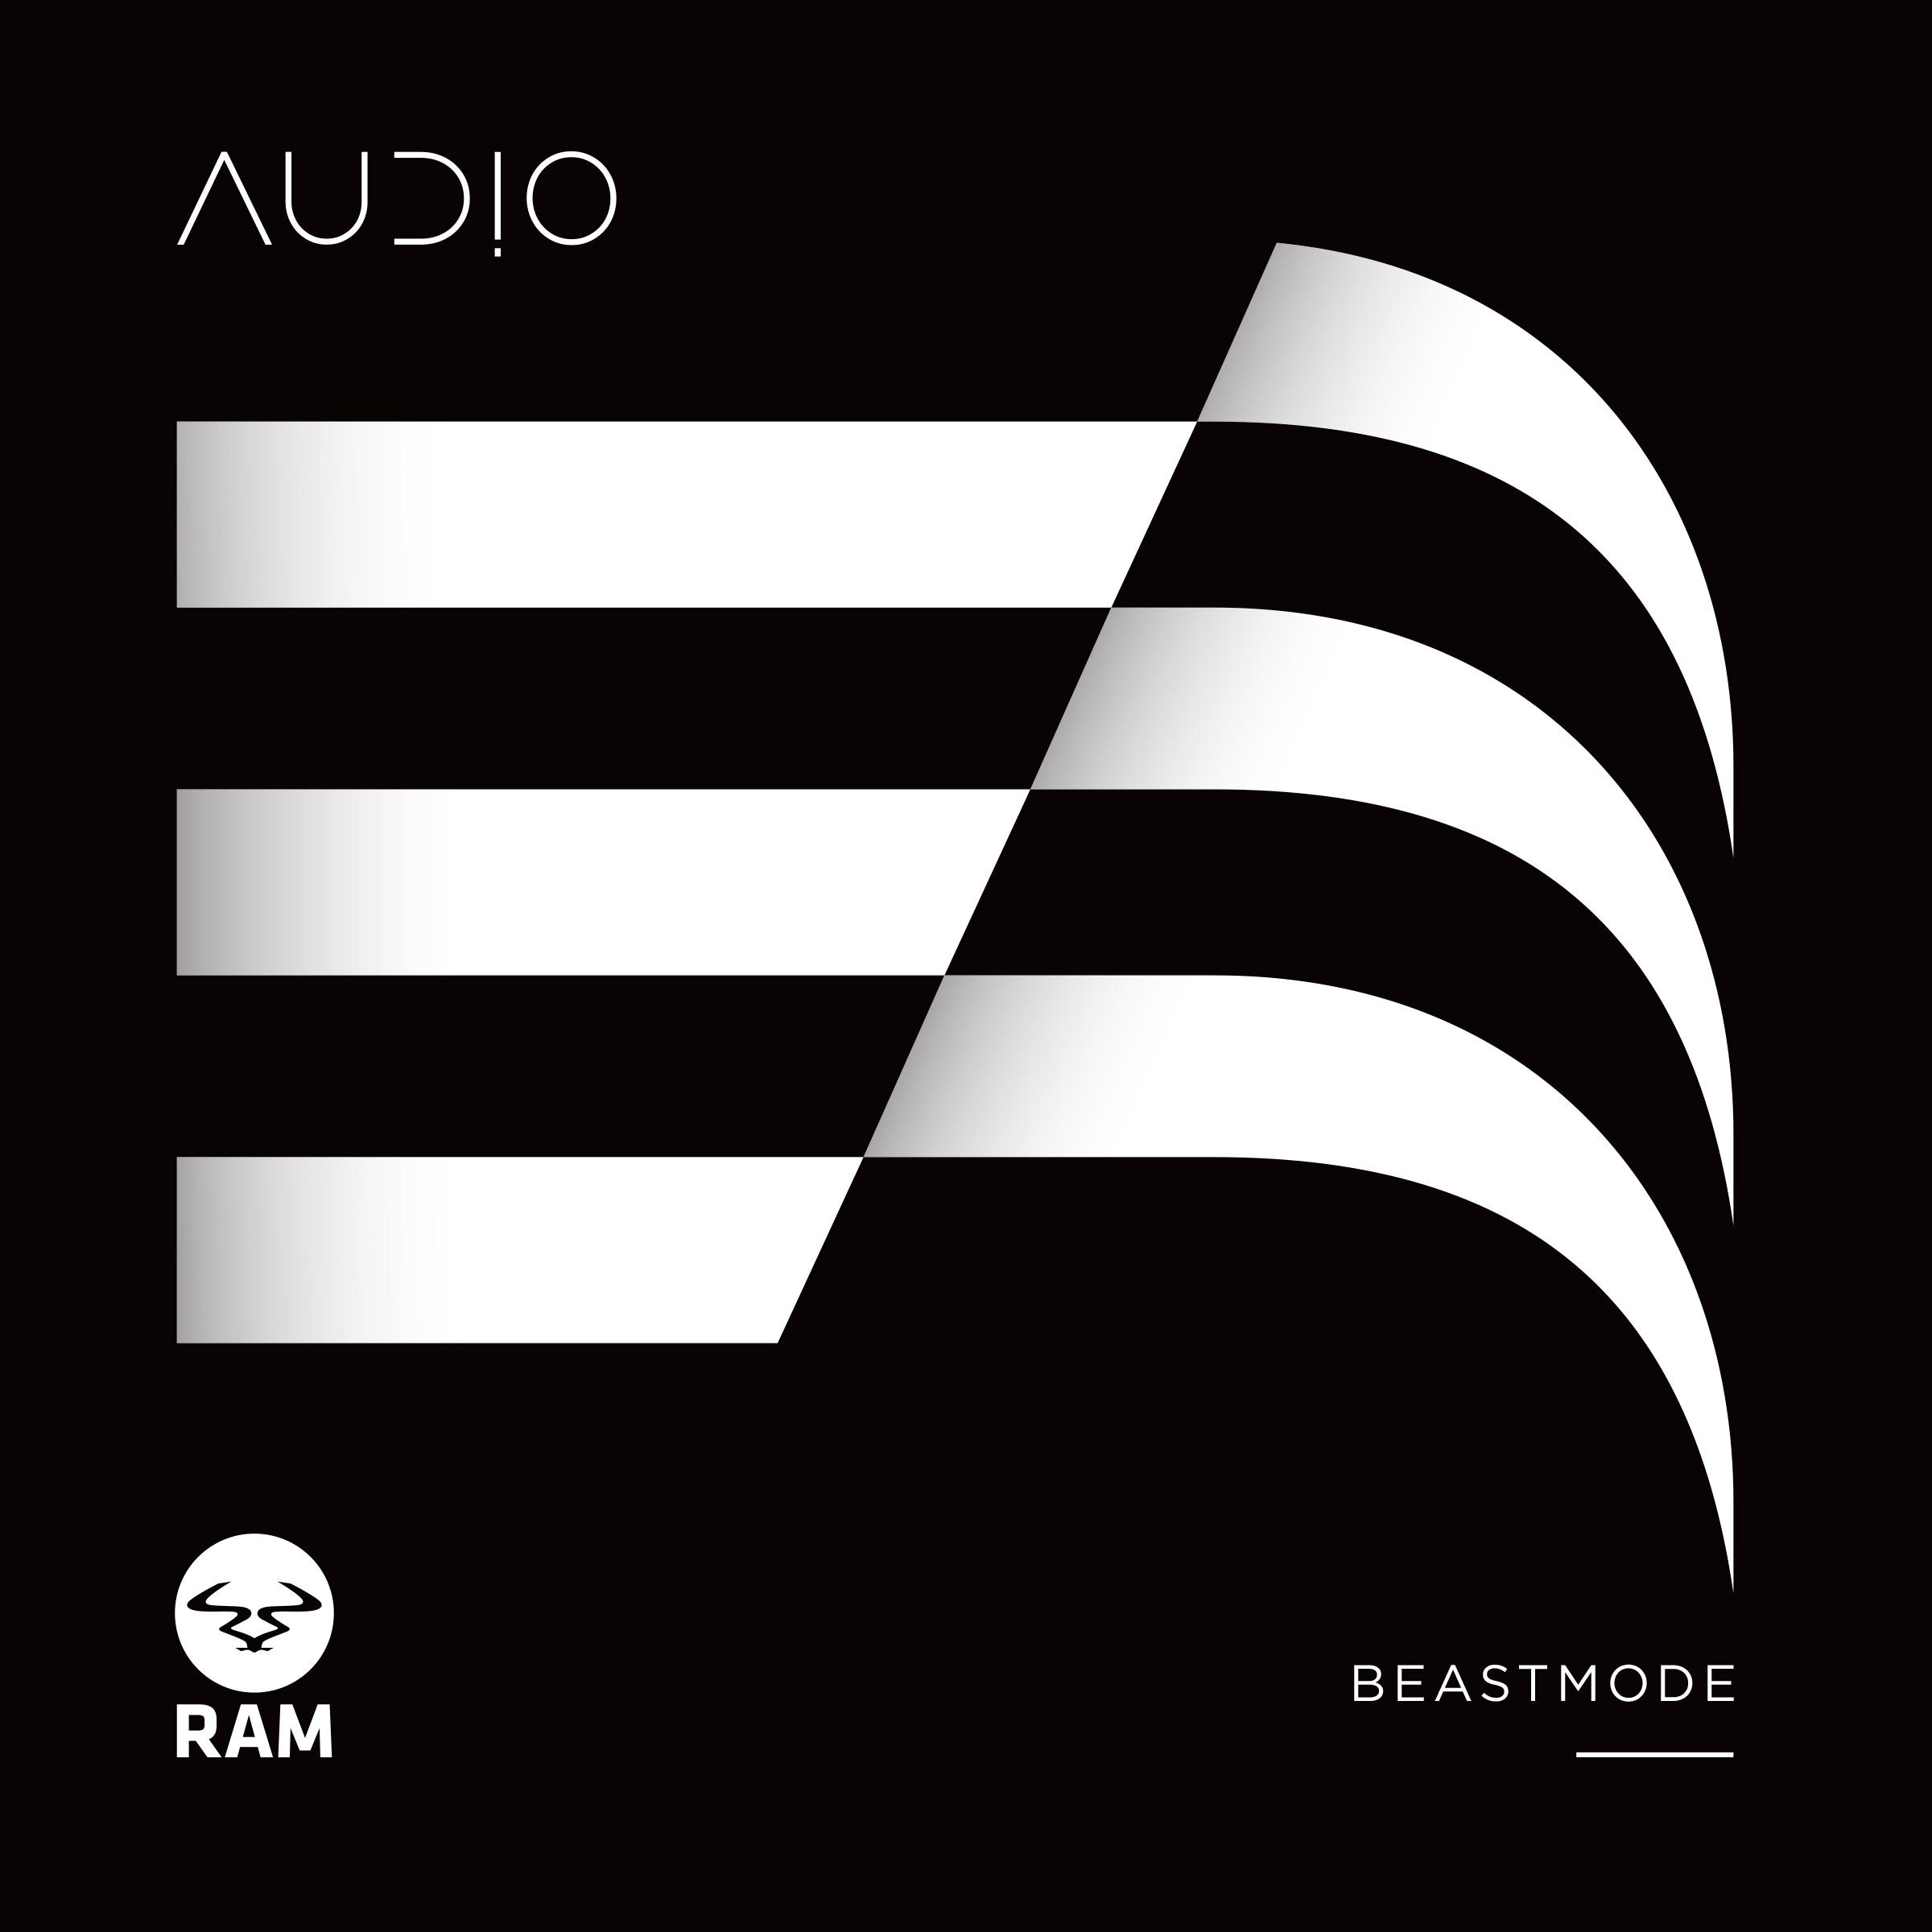 Audio/BEASTMODE 3LP